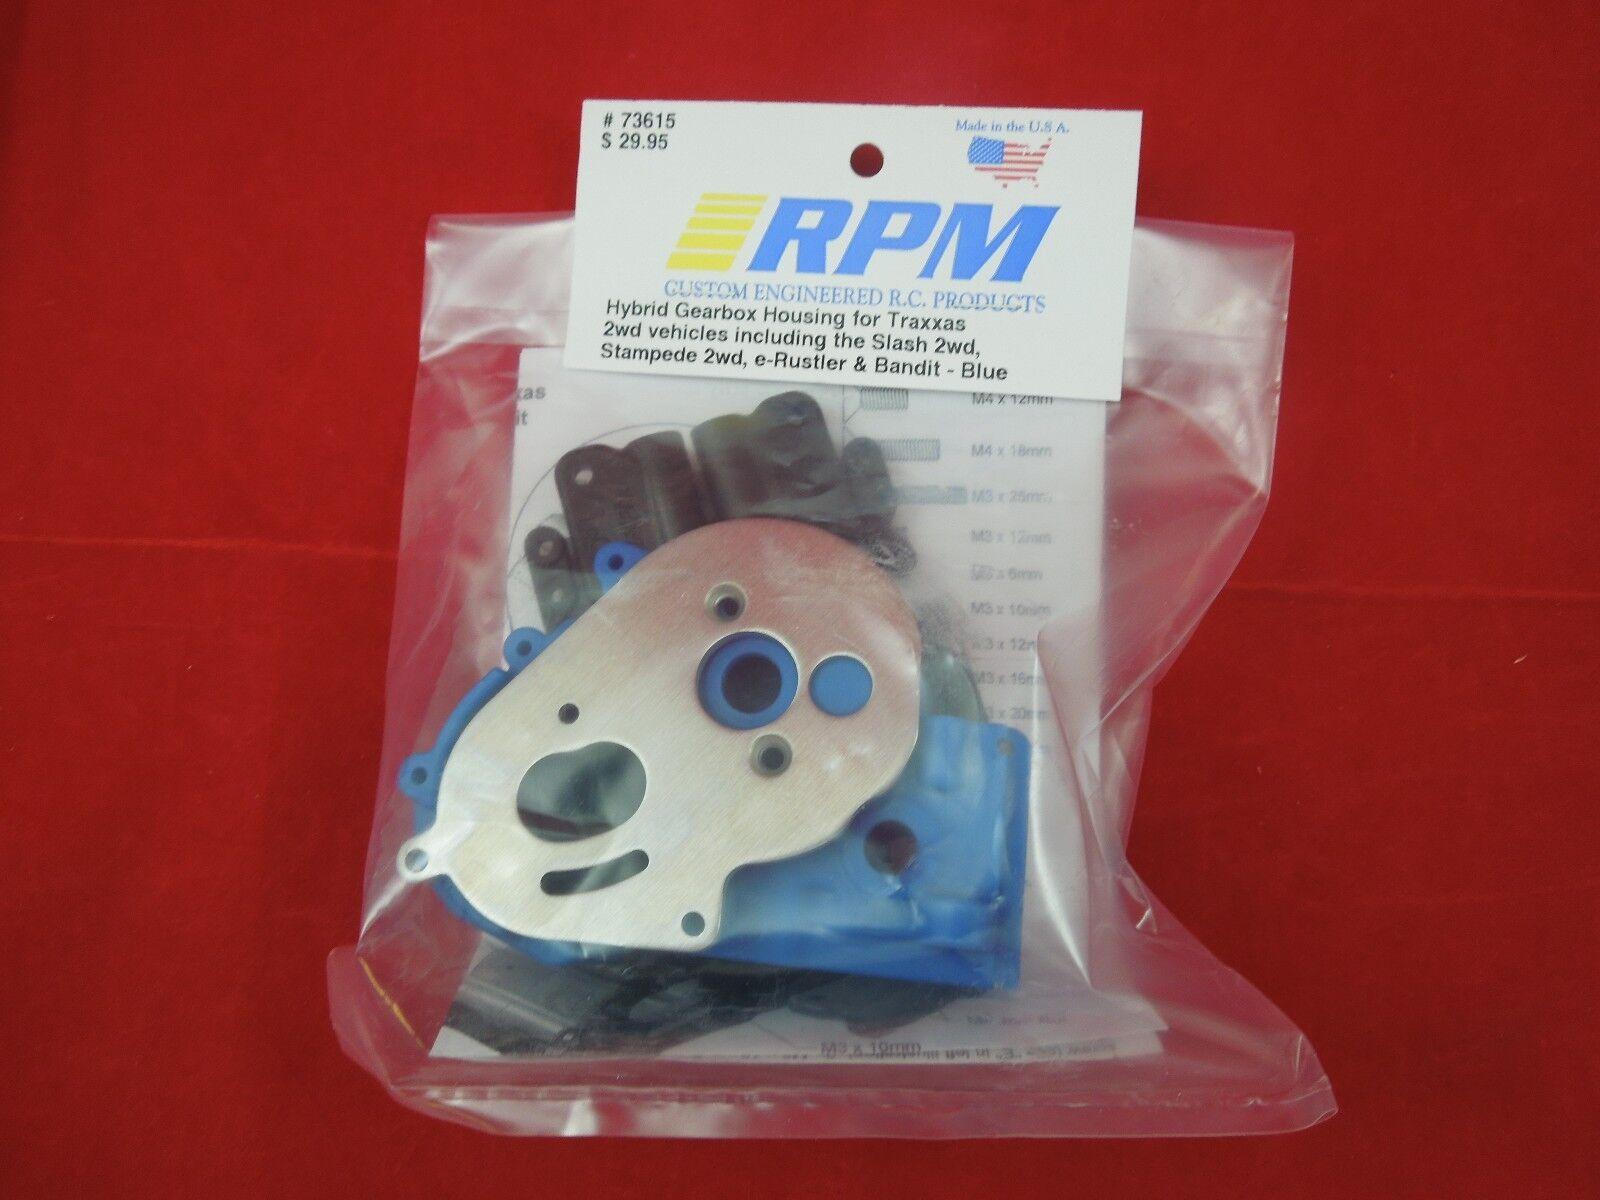 Traxxas Slash RPM Hybrid Gearbox Housing /& Rear Mount Kit Blue RPM73615